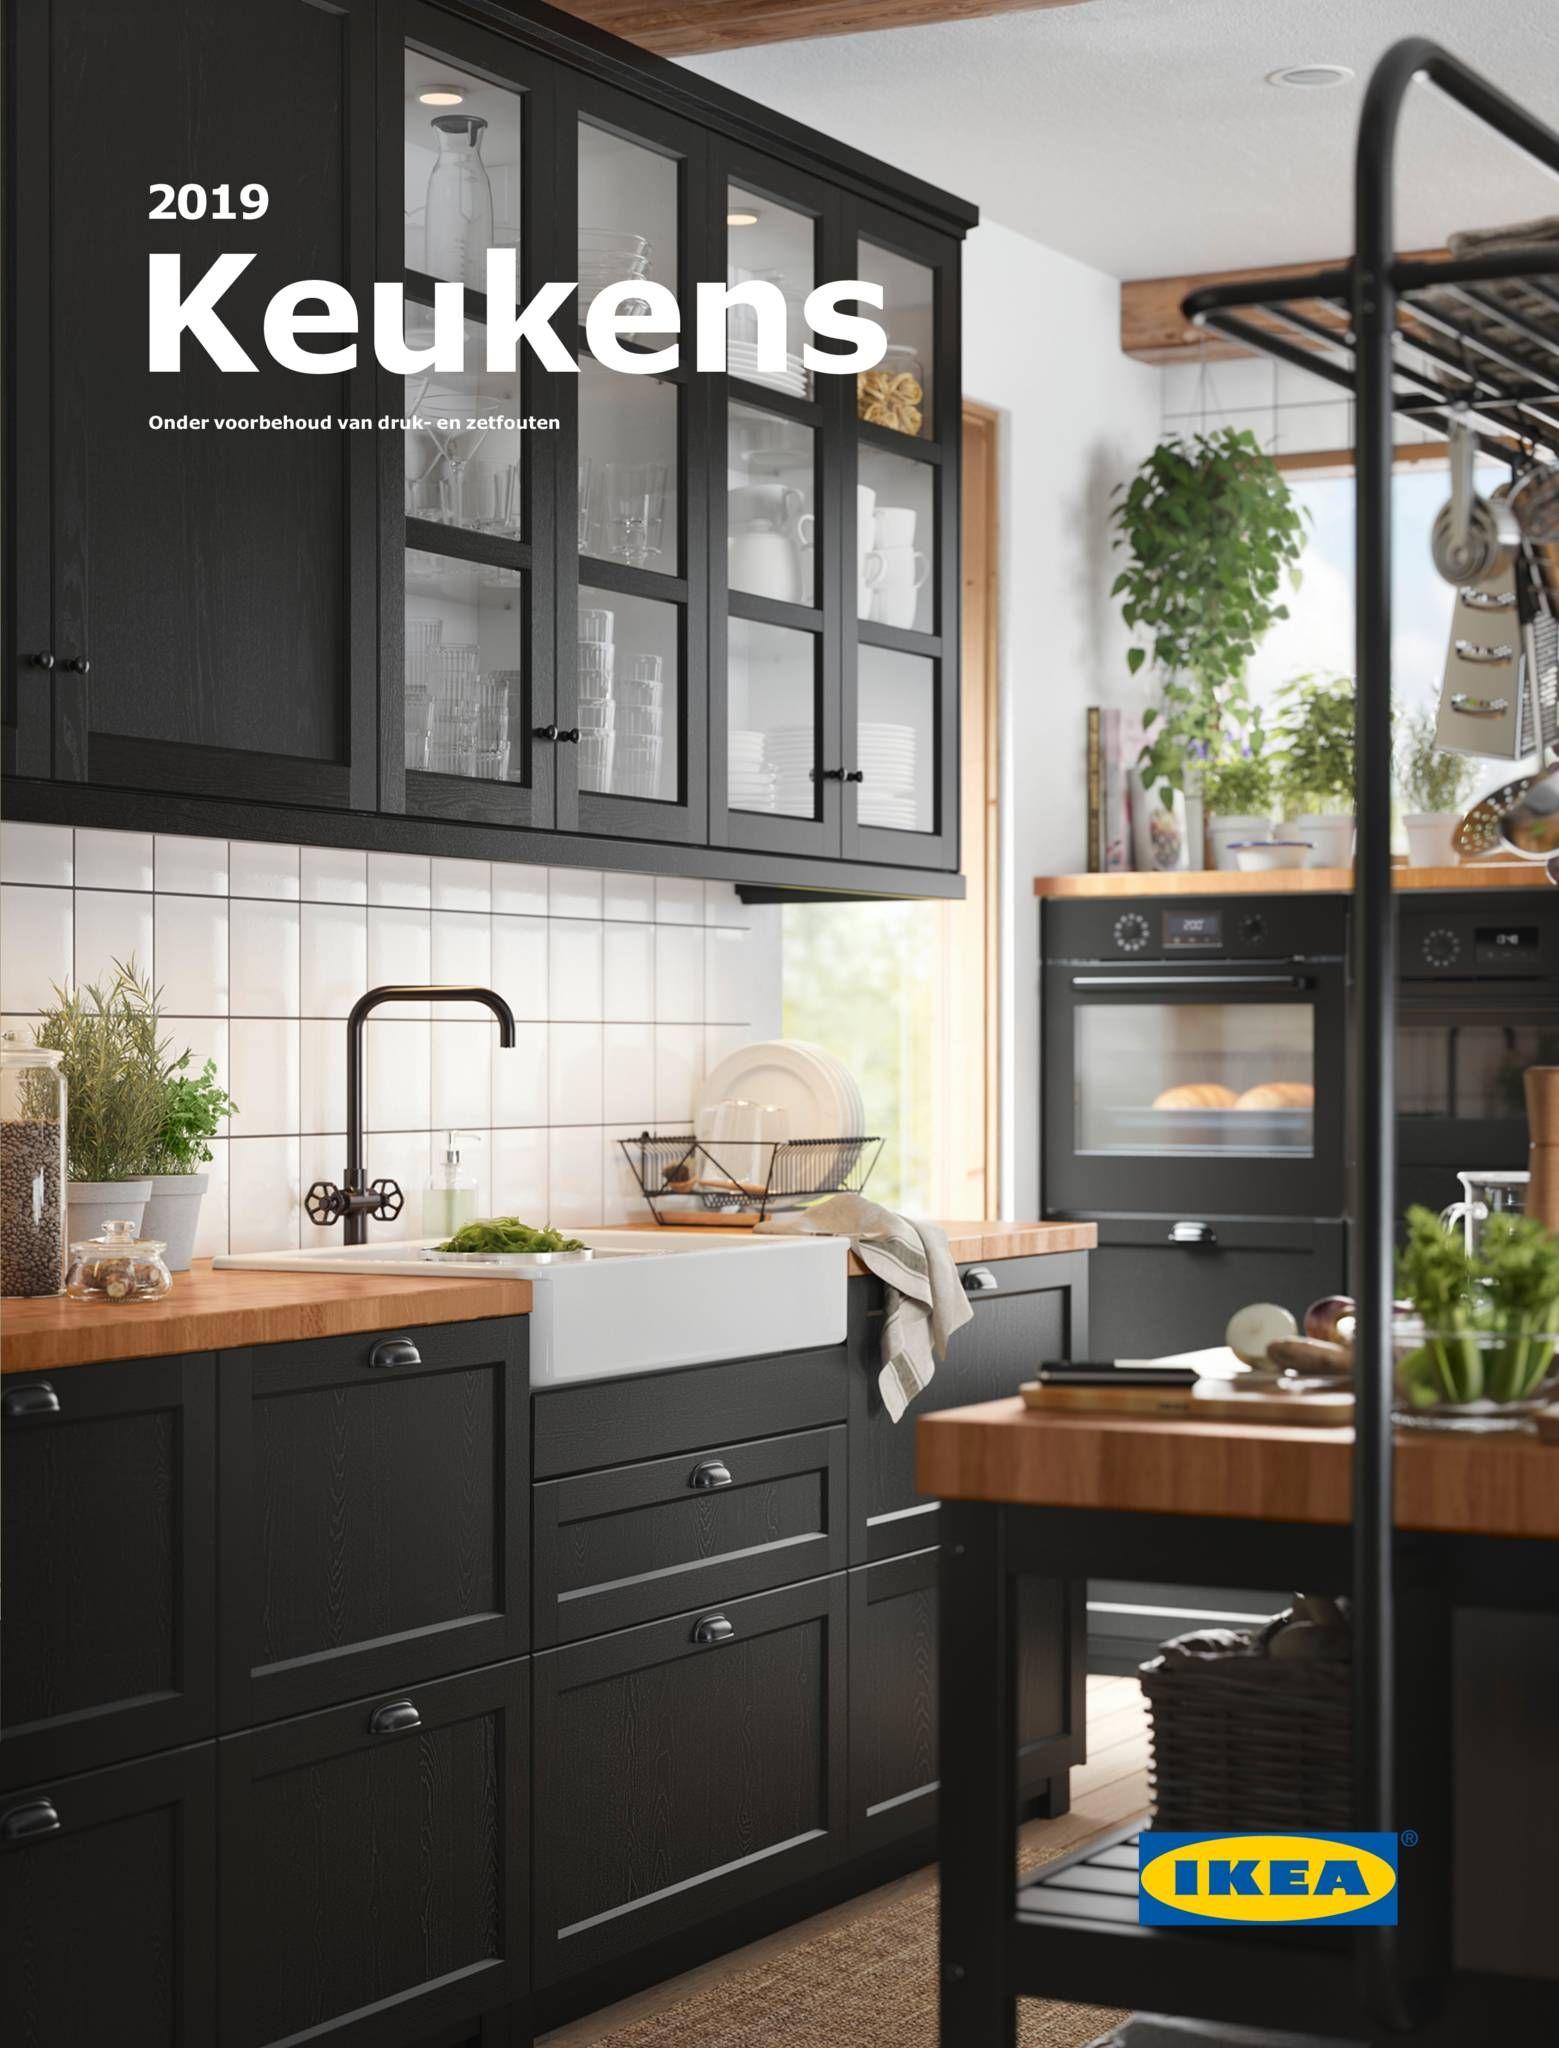 Ongekend Keukenbrochure 2019 - Brochure keukens | Keukens, Keuken idee AW-21